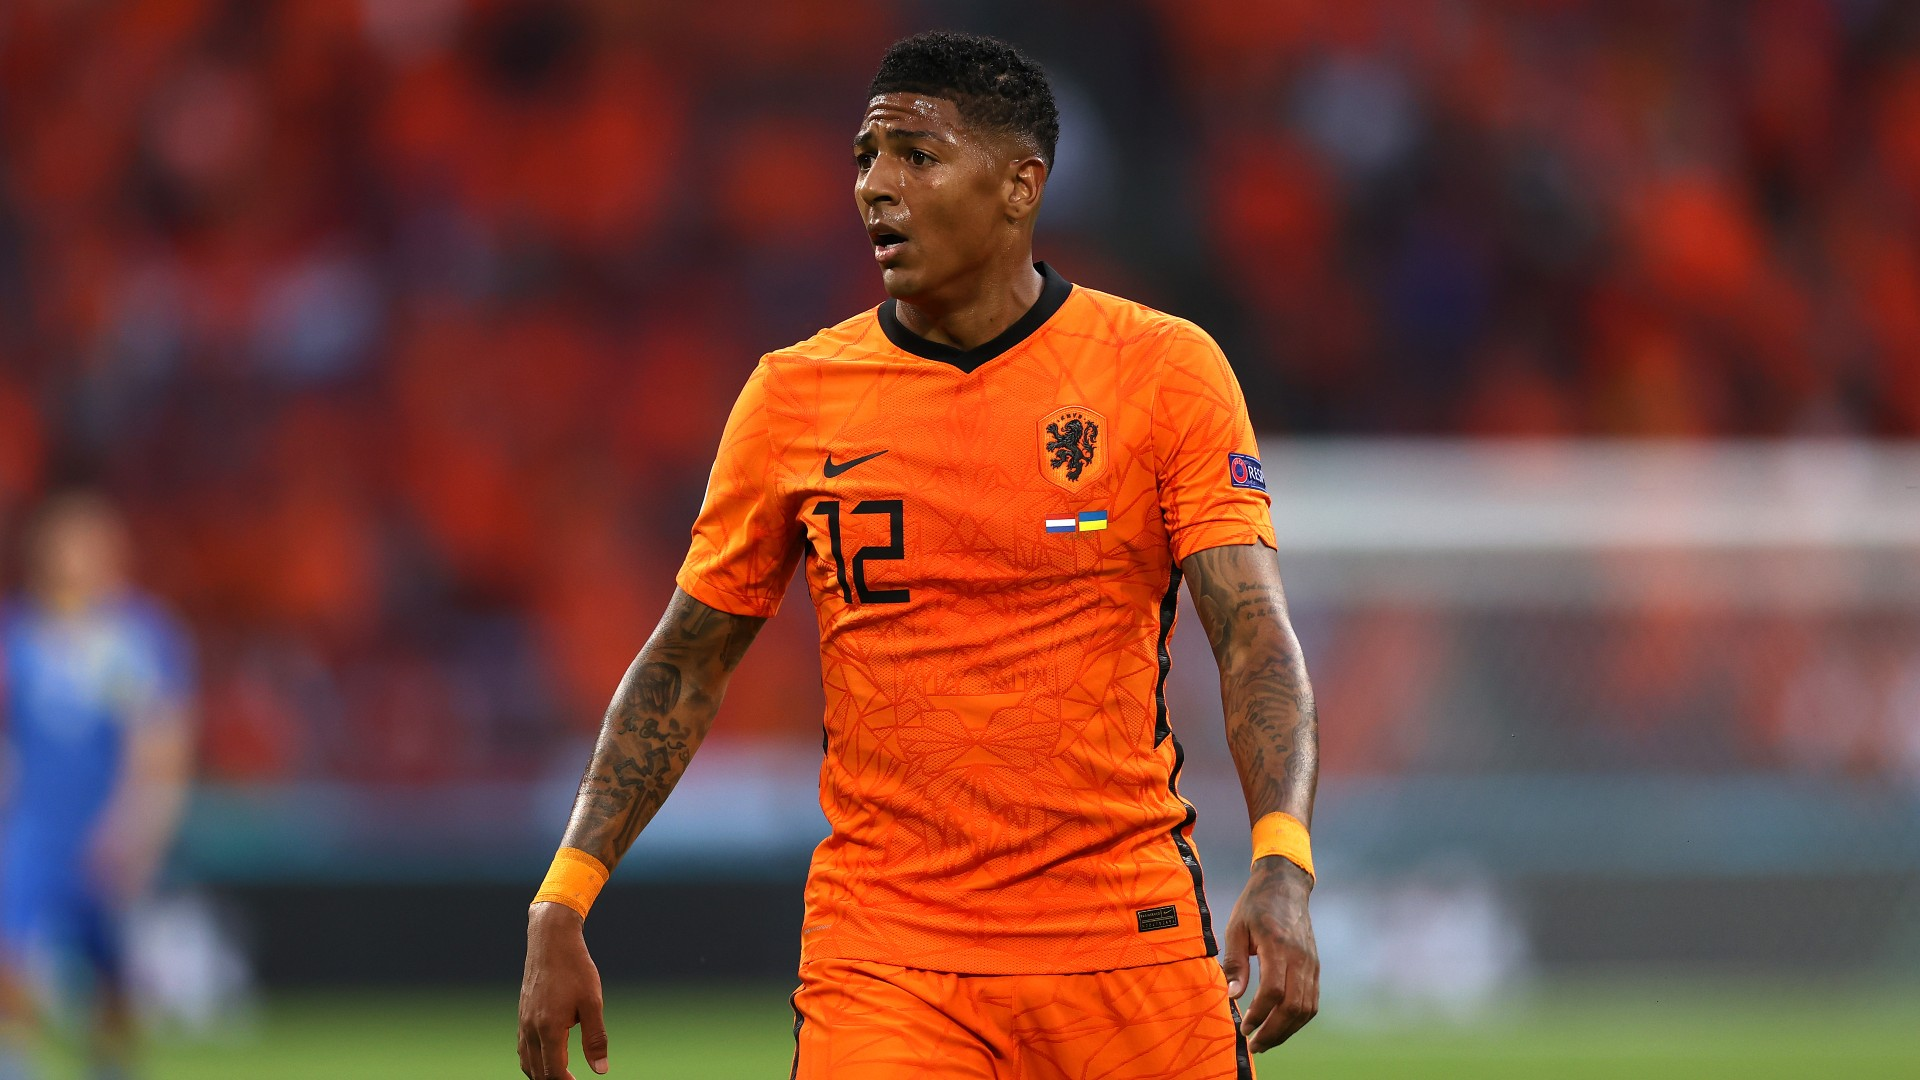 YORUM   Patrick van Aanholt, Galatasaray'ın soluna dinamizm katabilir mi?    Goal.com